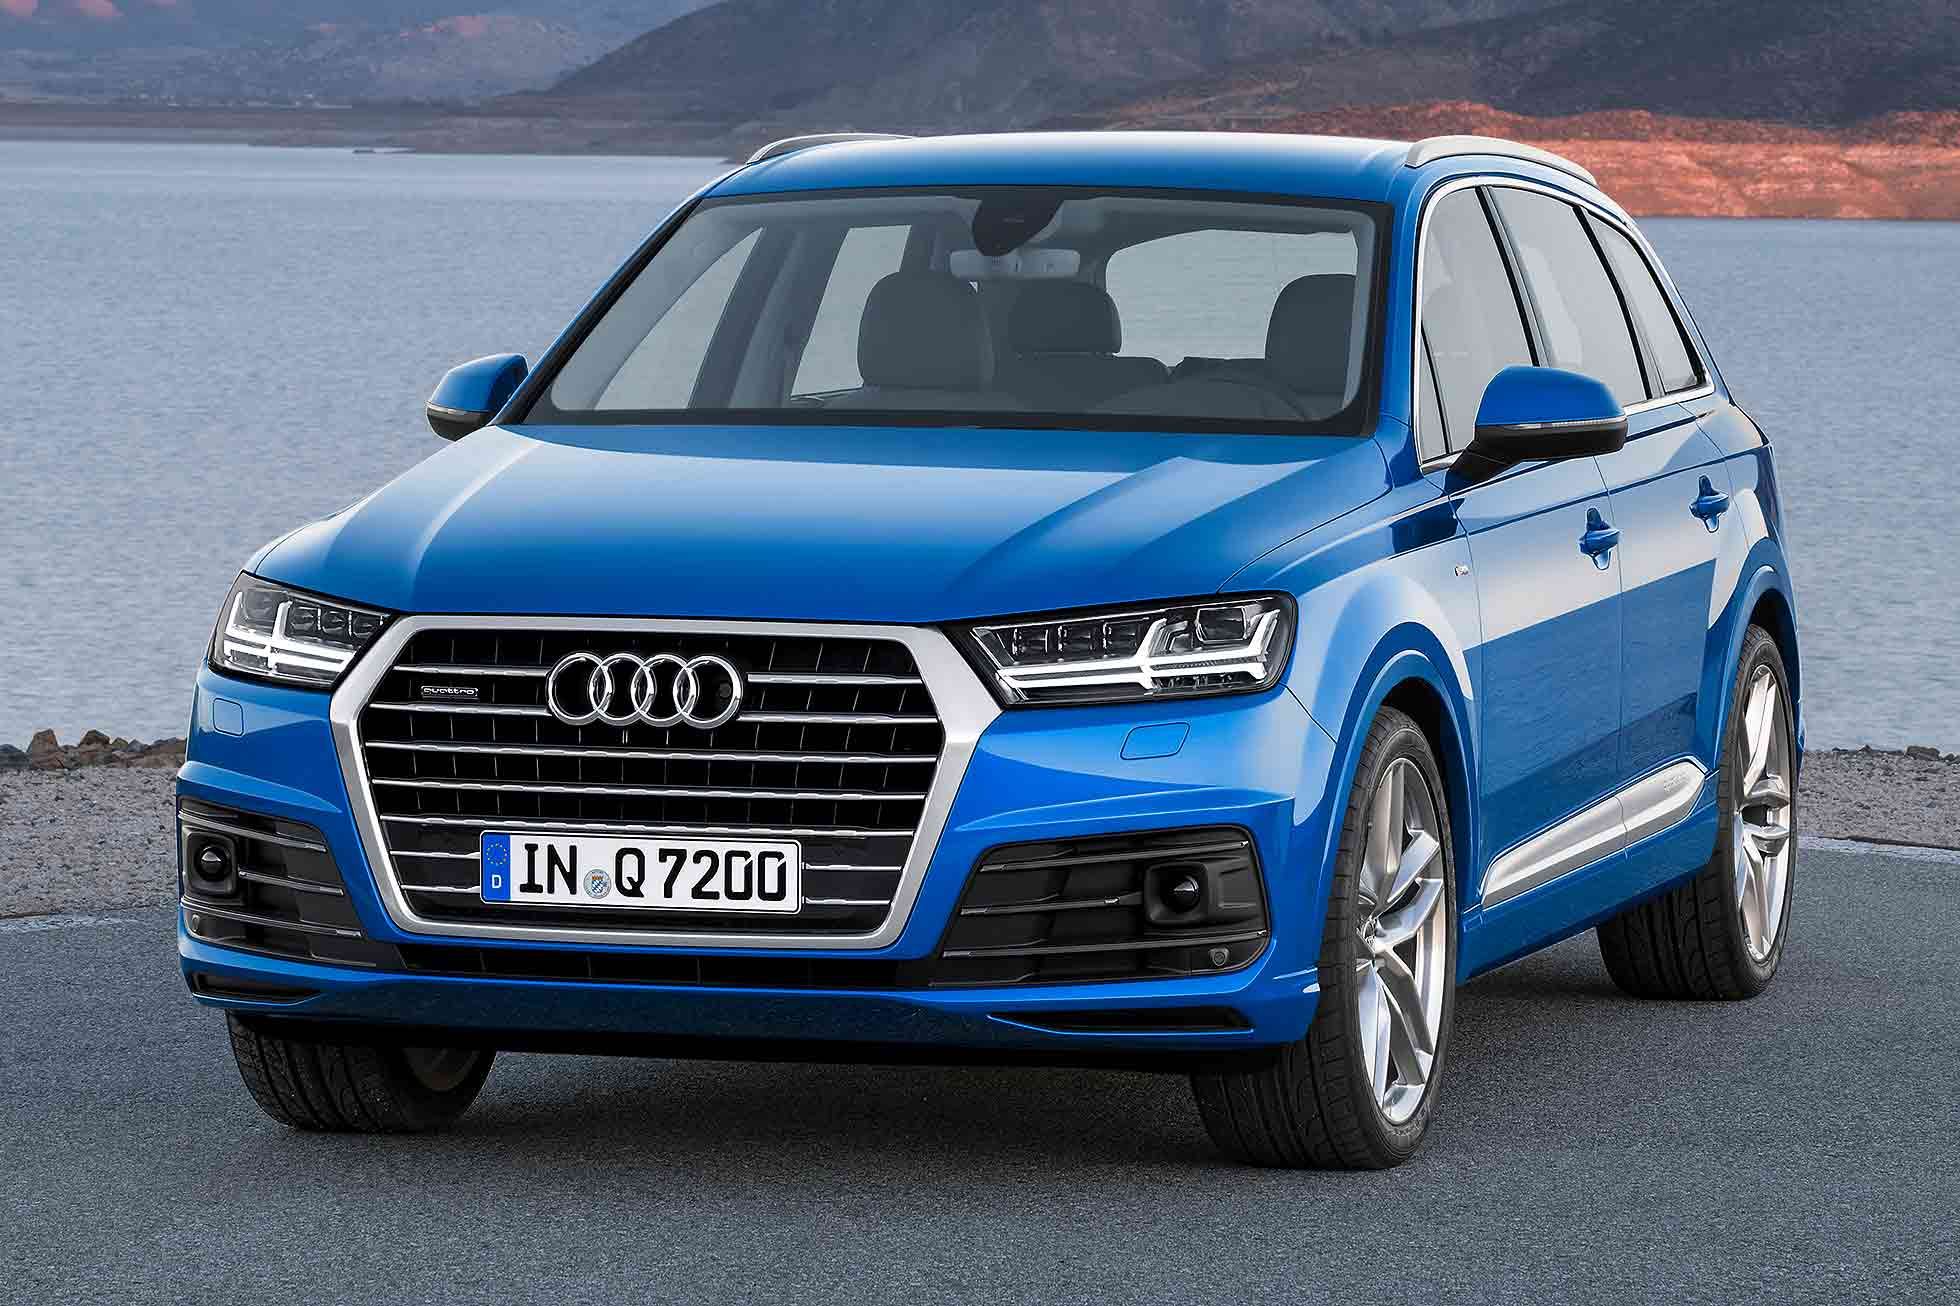 01_Audi_Q7_2015.jpg